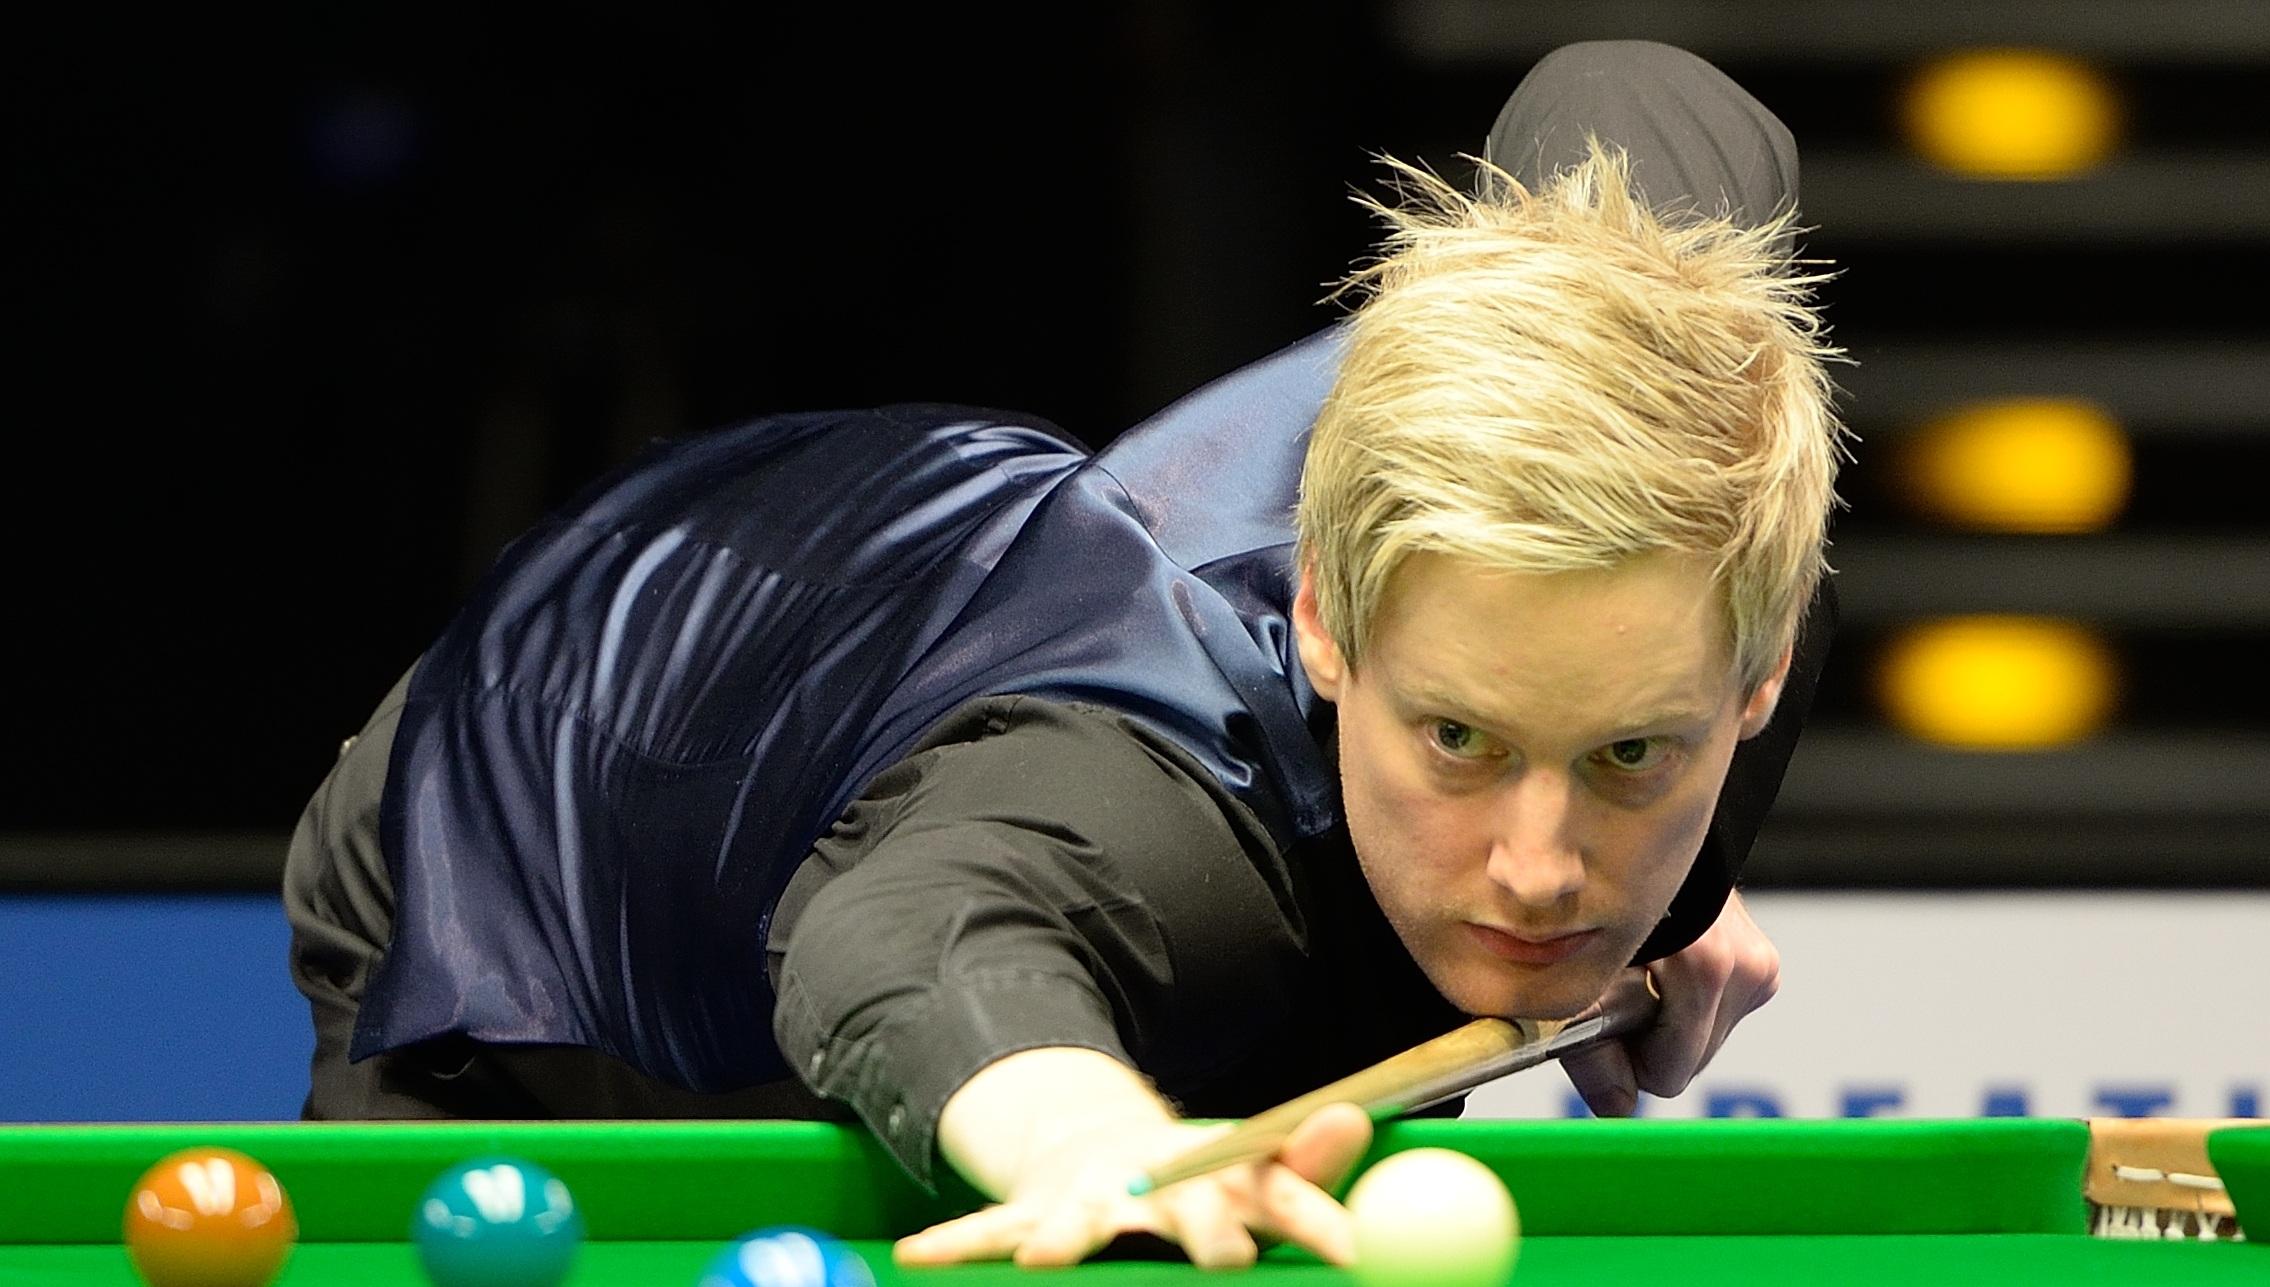 Neil_Robertson_at_Snooker_German_Masters_%28DerHexer%29_2015-02-05_02.jpg